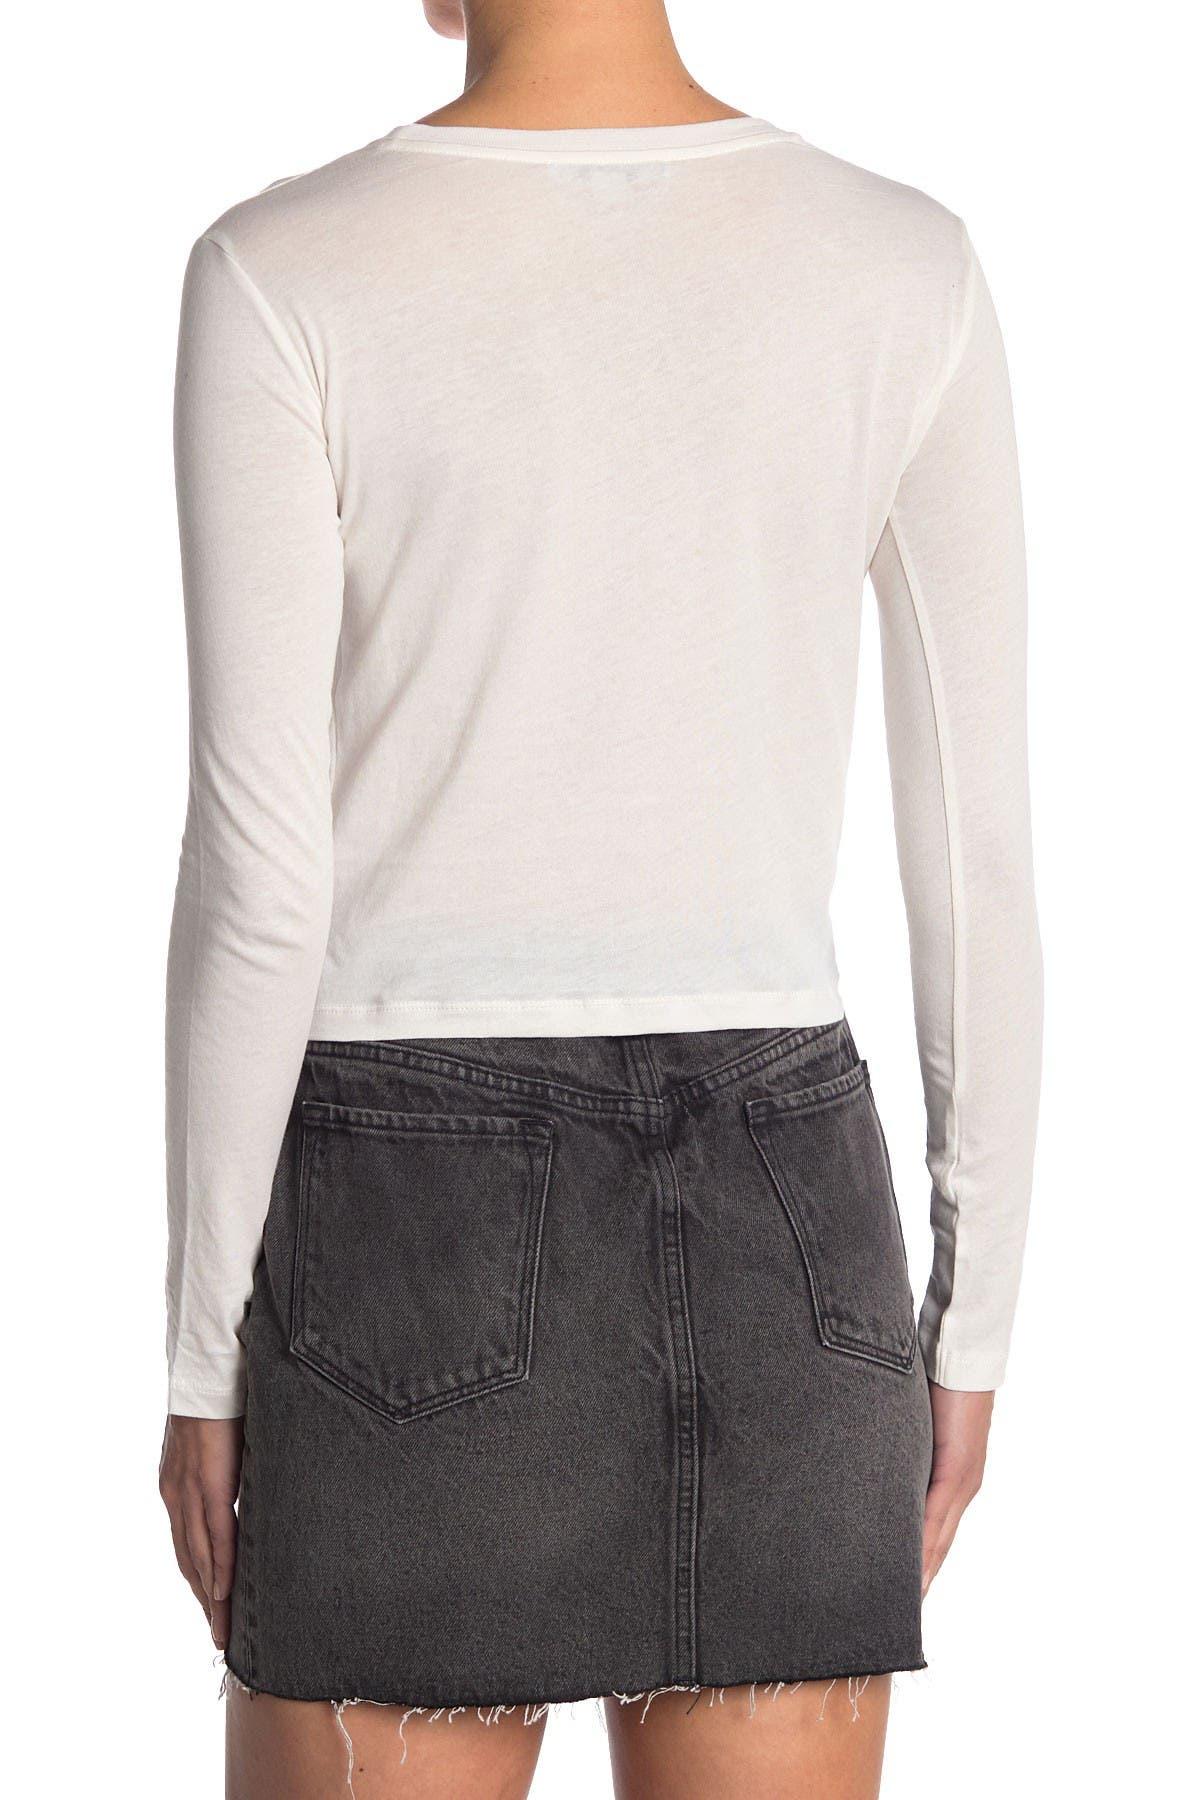 Image of ALLSAINTS Carme Long Sleeve Twist Crop T-Shirt